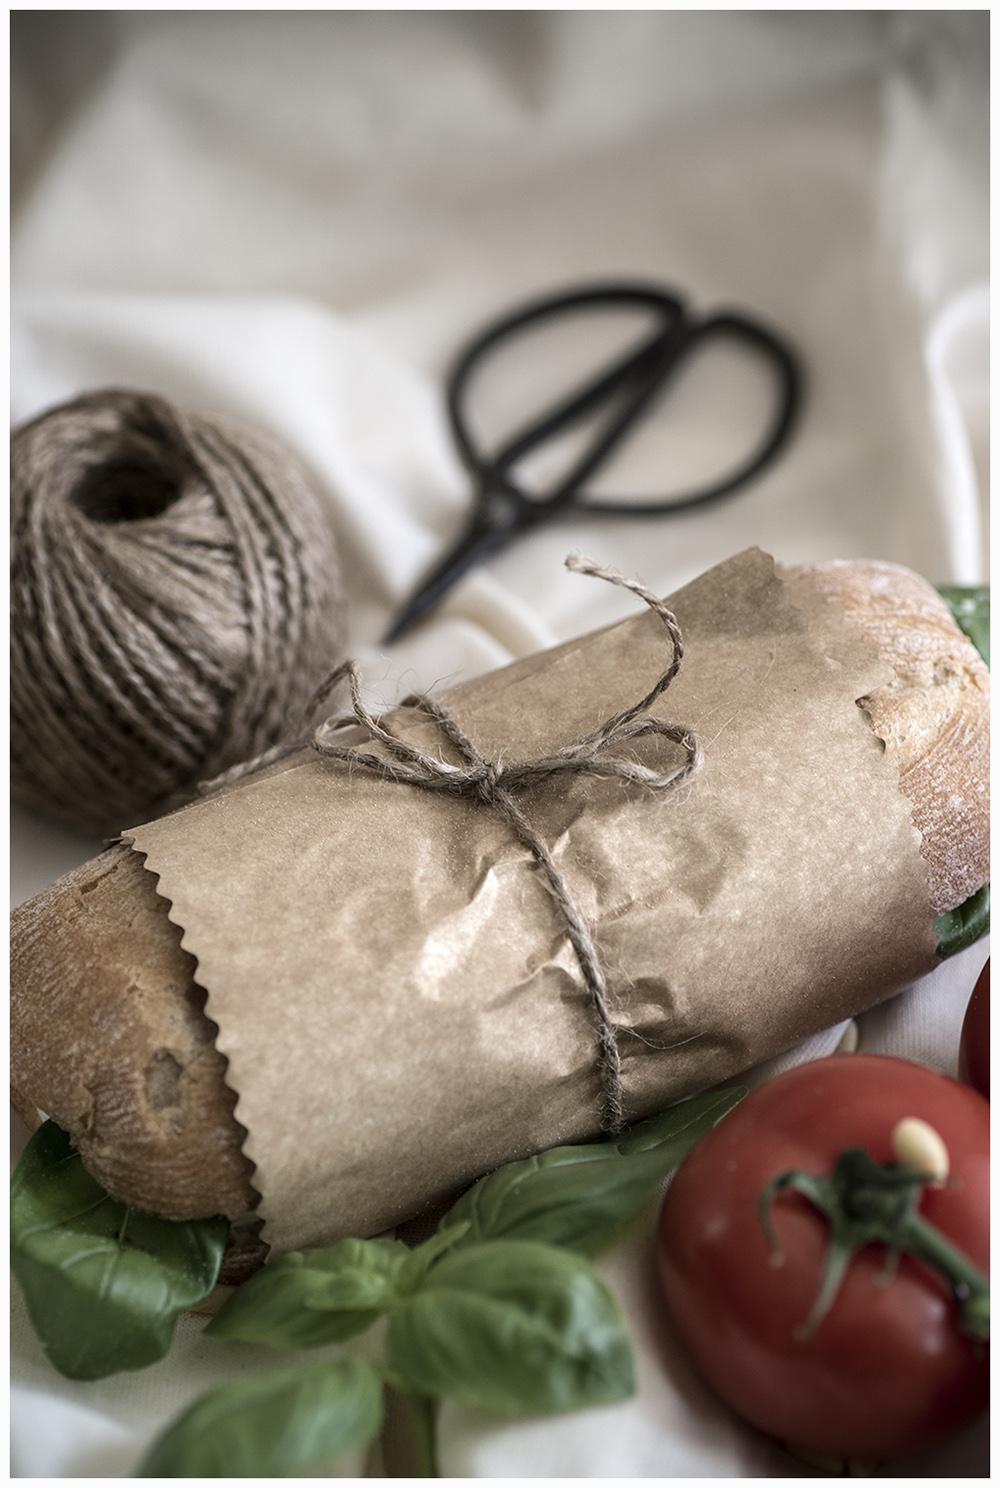 Wrapped up Ciabatta Sandwich